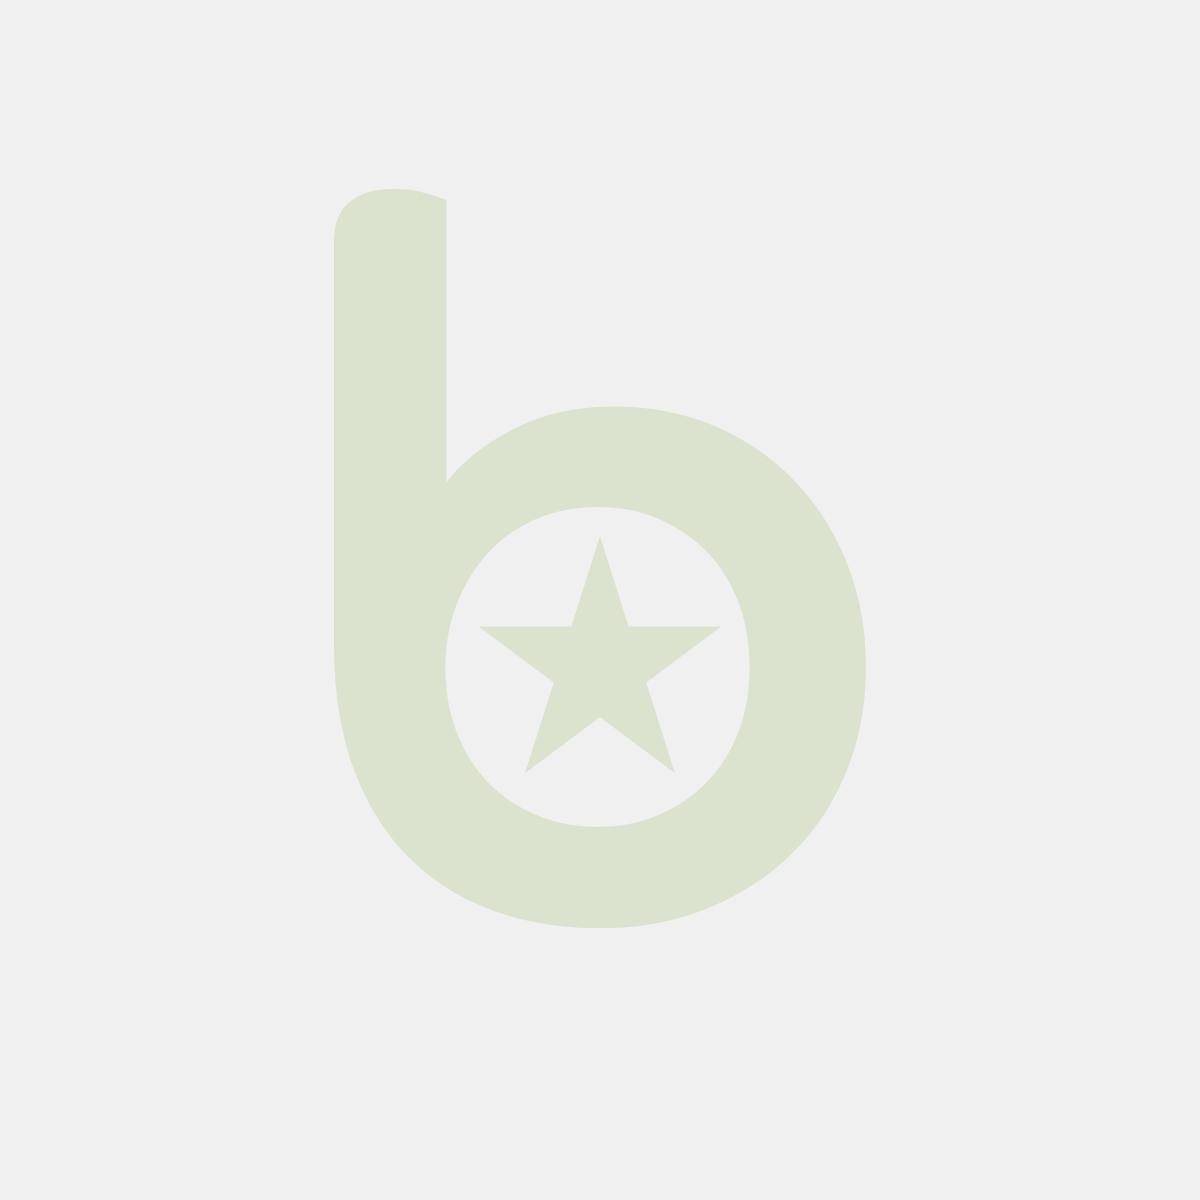 Rożek na FRYTKI, NUGGETSY, CHURROSSY 500g średni Kratka Czarna z miejscem na DIP 200/290mm op. 100 sztuk